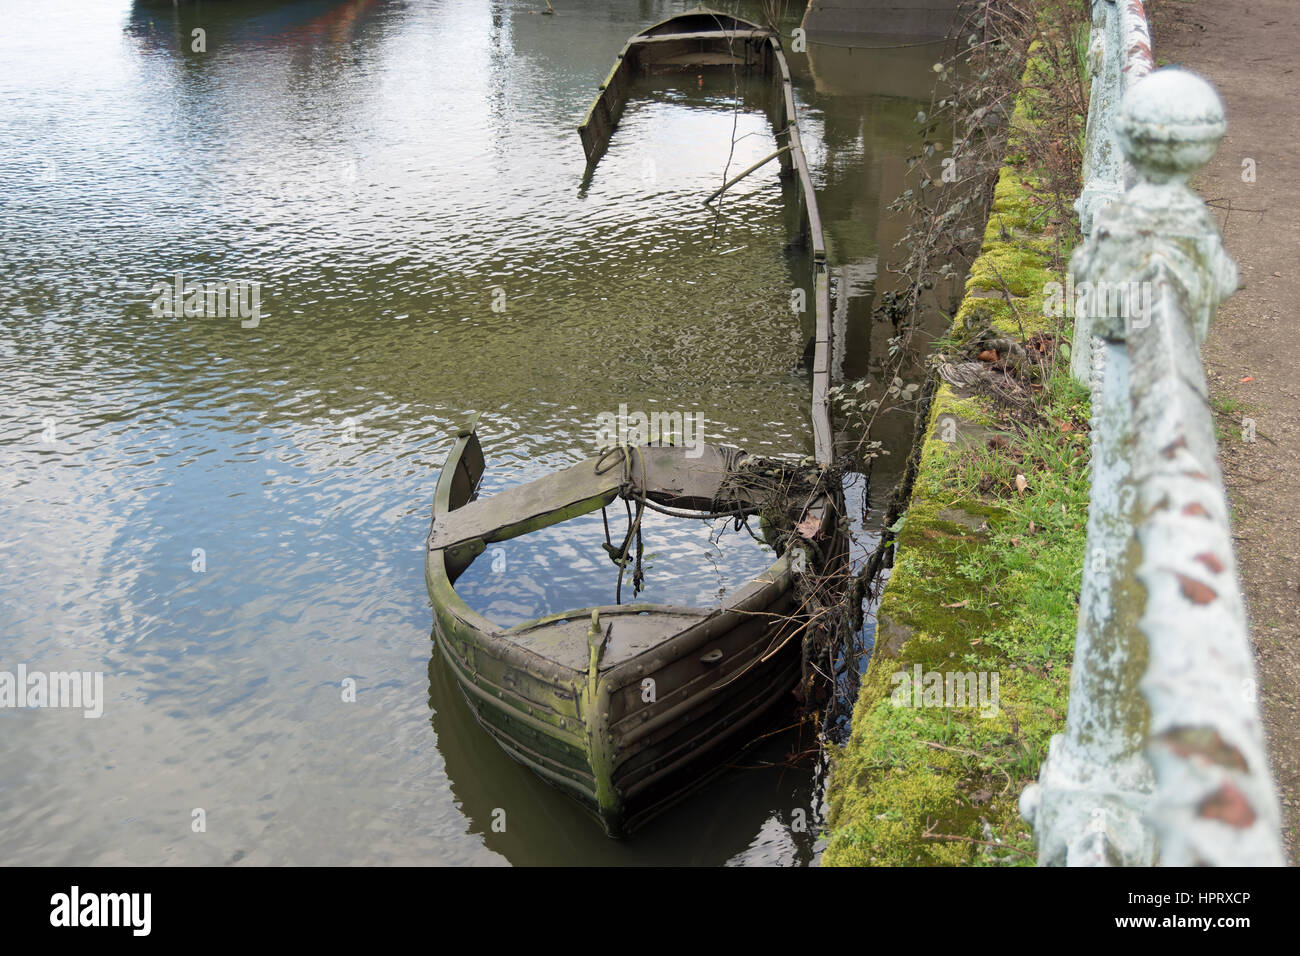 partially submerged boat on the river thames near richmond bridge, southwest london, england - Stock Image